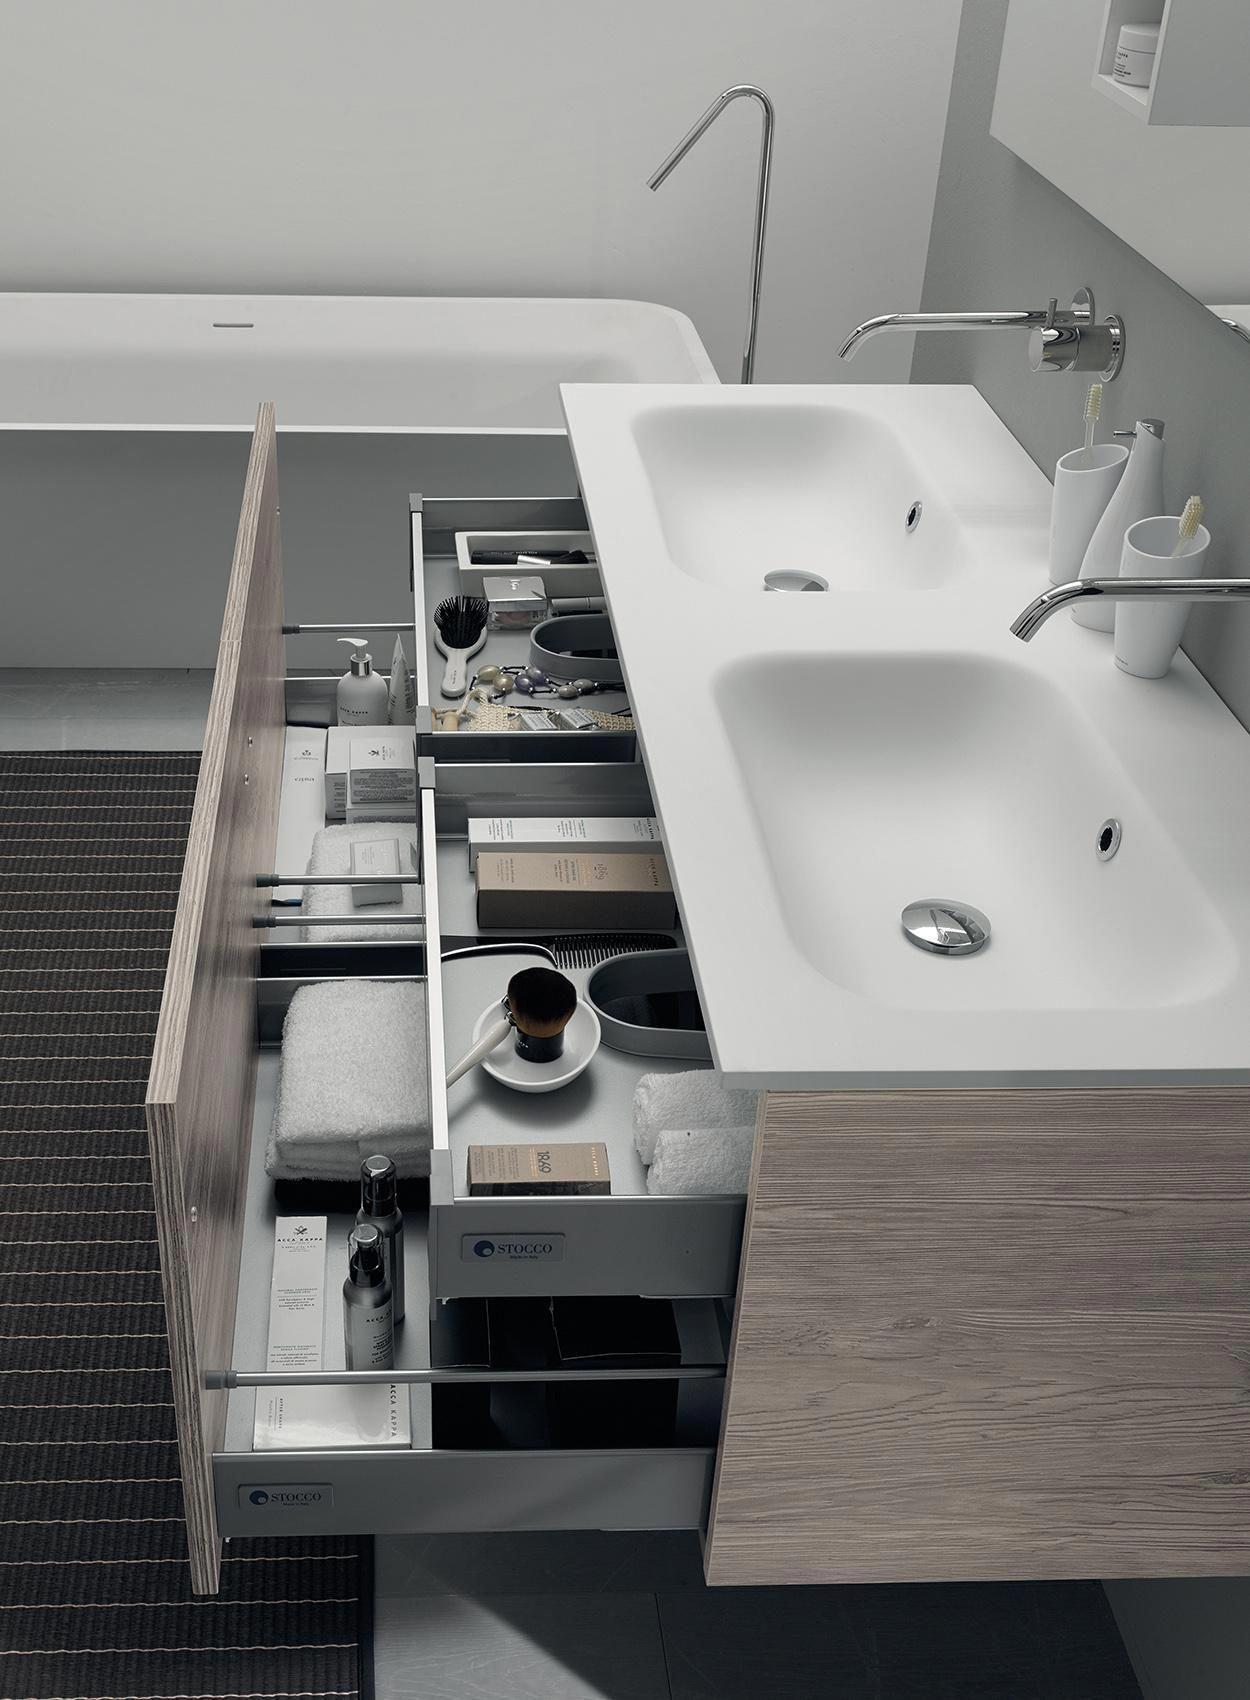 Surprising Cocoon Wash Basin Design Inspiration High End Bathroom Download Free Architecture Designs Grimeyleaguecom